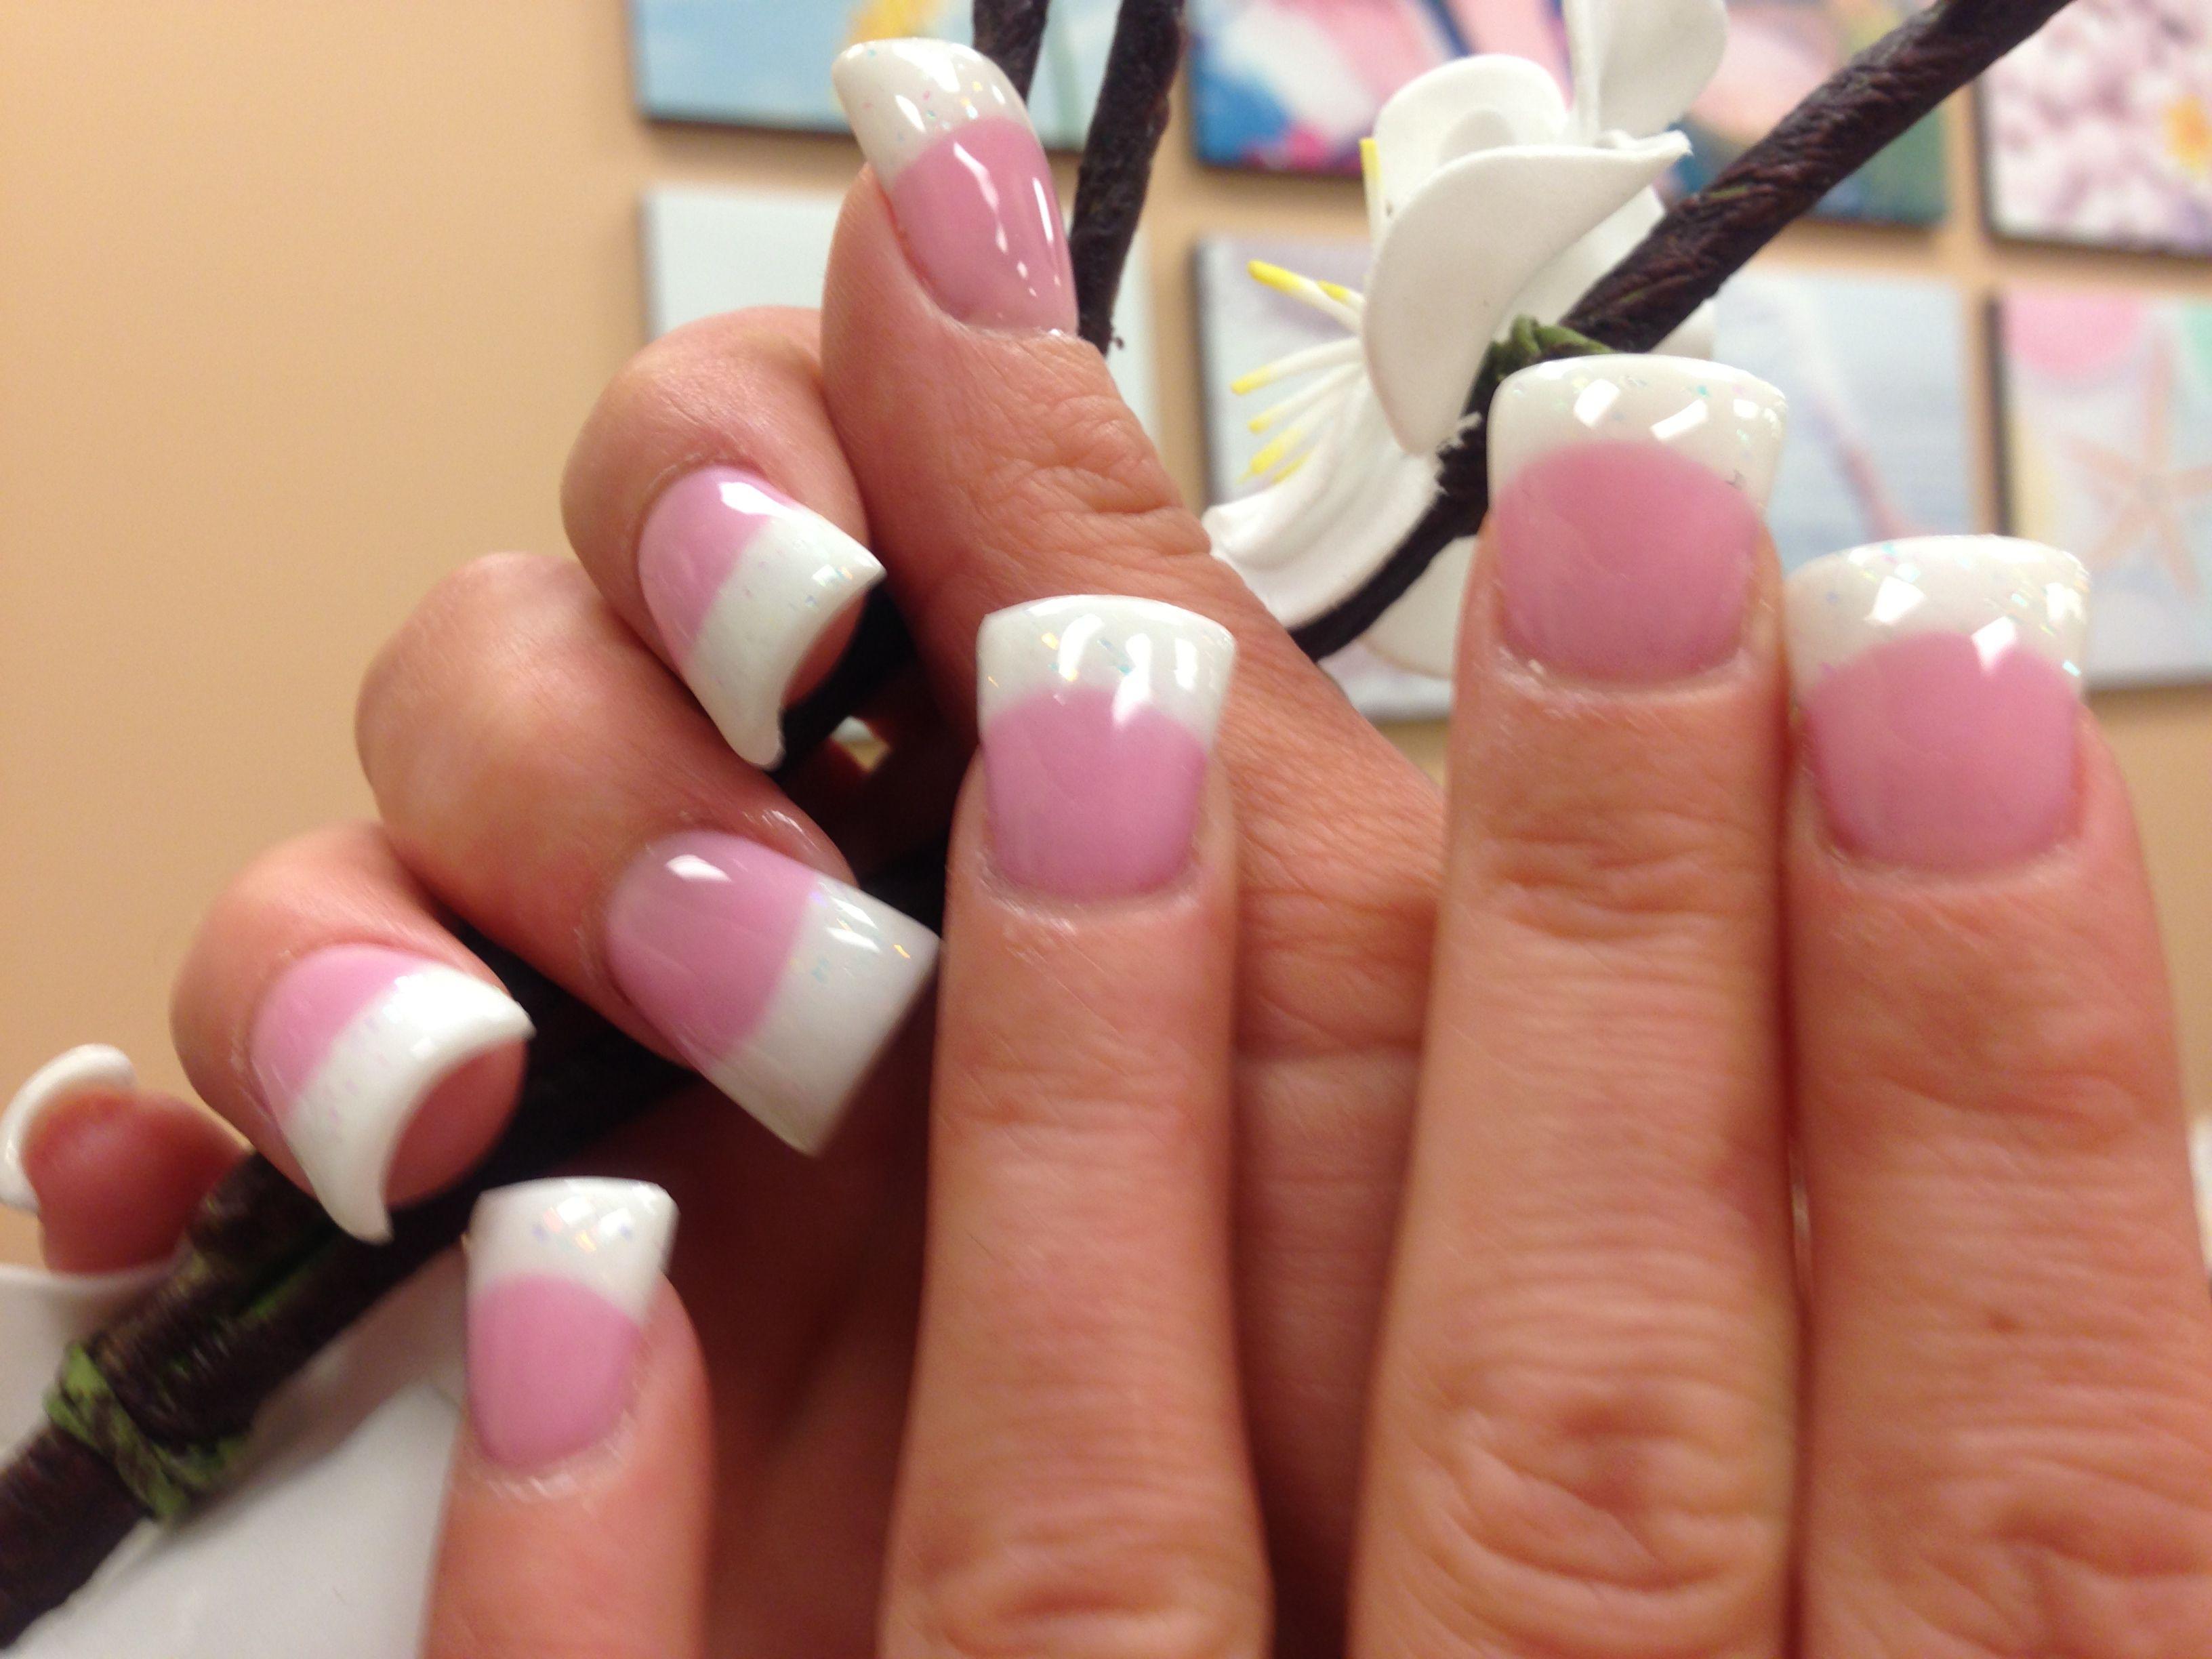 Pink & White Fan at lvsalonandspa.com | Nails Arts | Pinterest ...